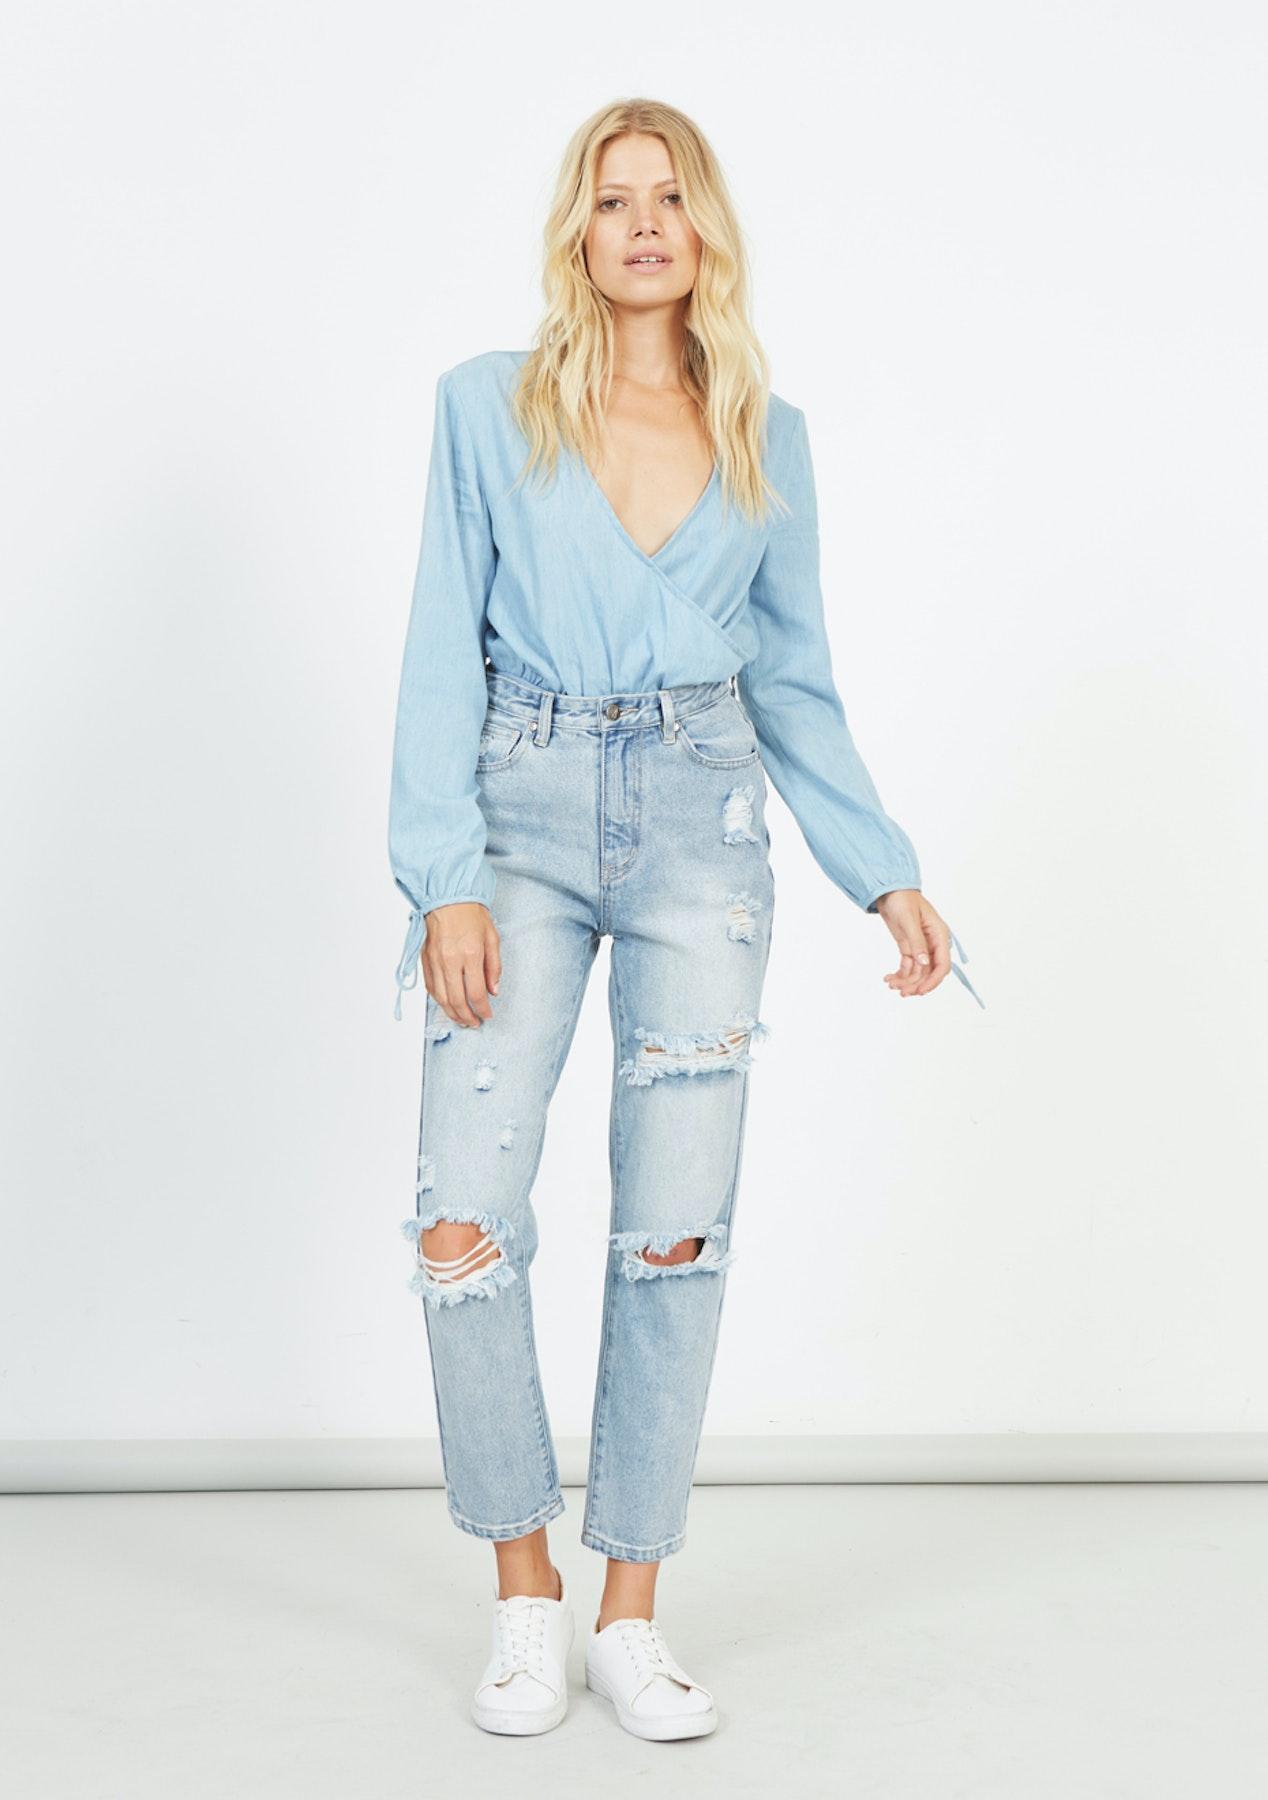 708a3551b0 Minkpink - Ava Chambray Blouse Bodysuit - Light Blue - Minkpink - Onceit